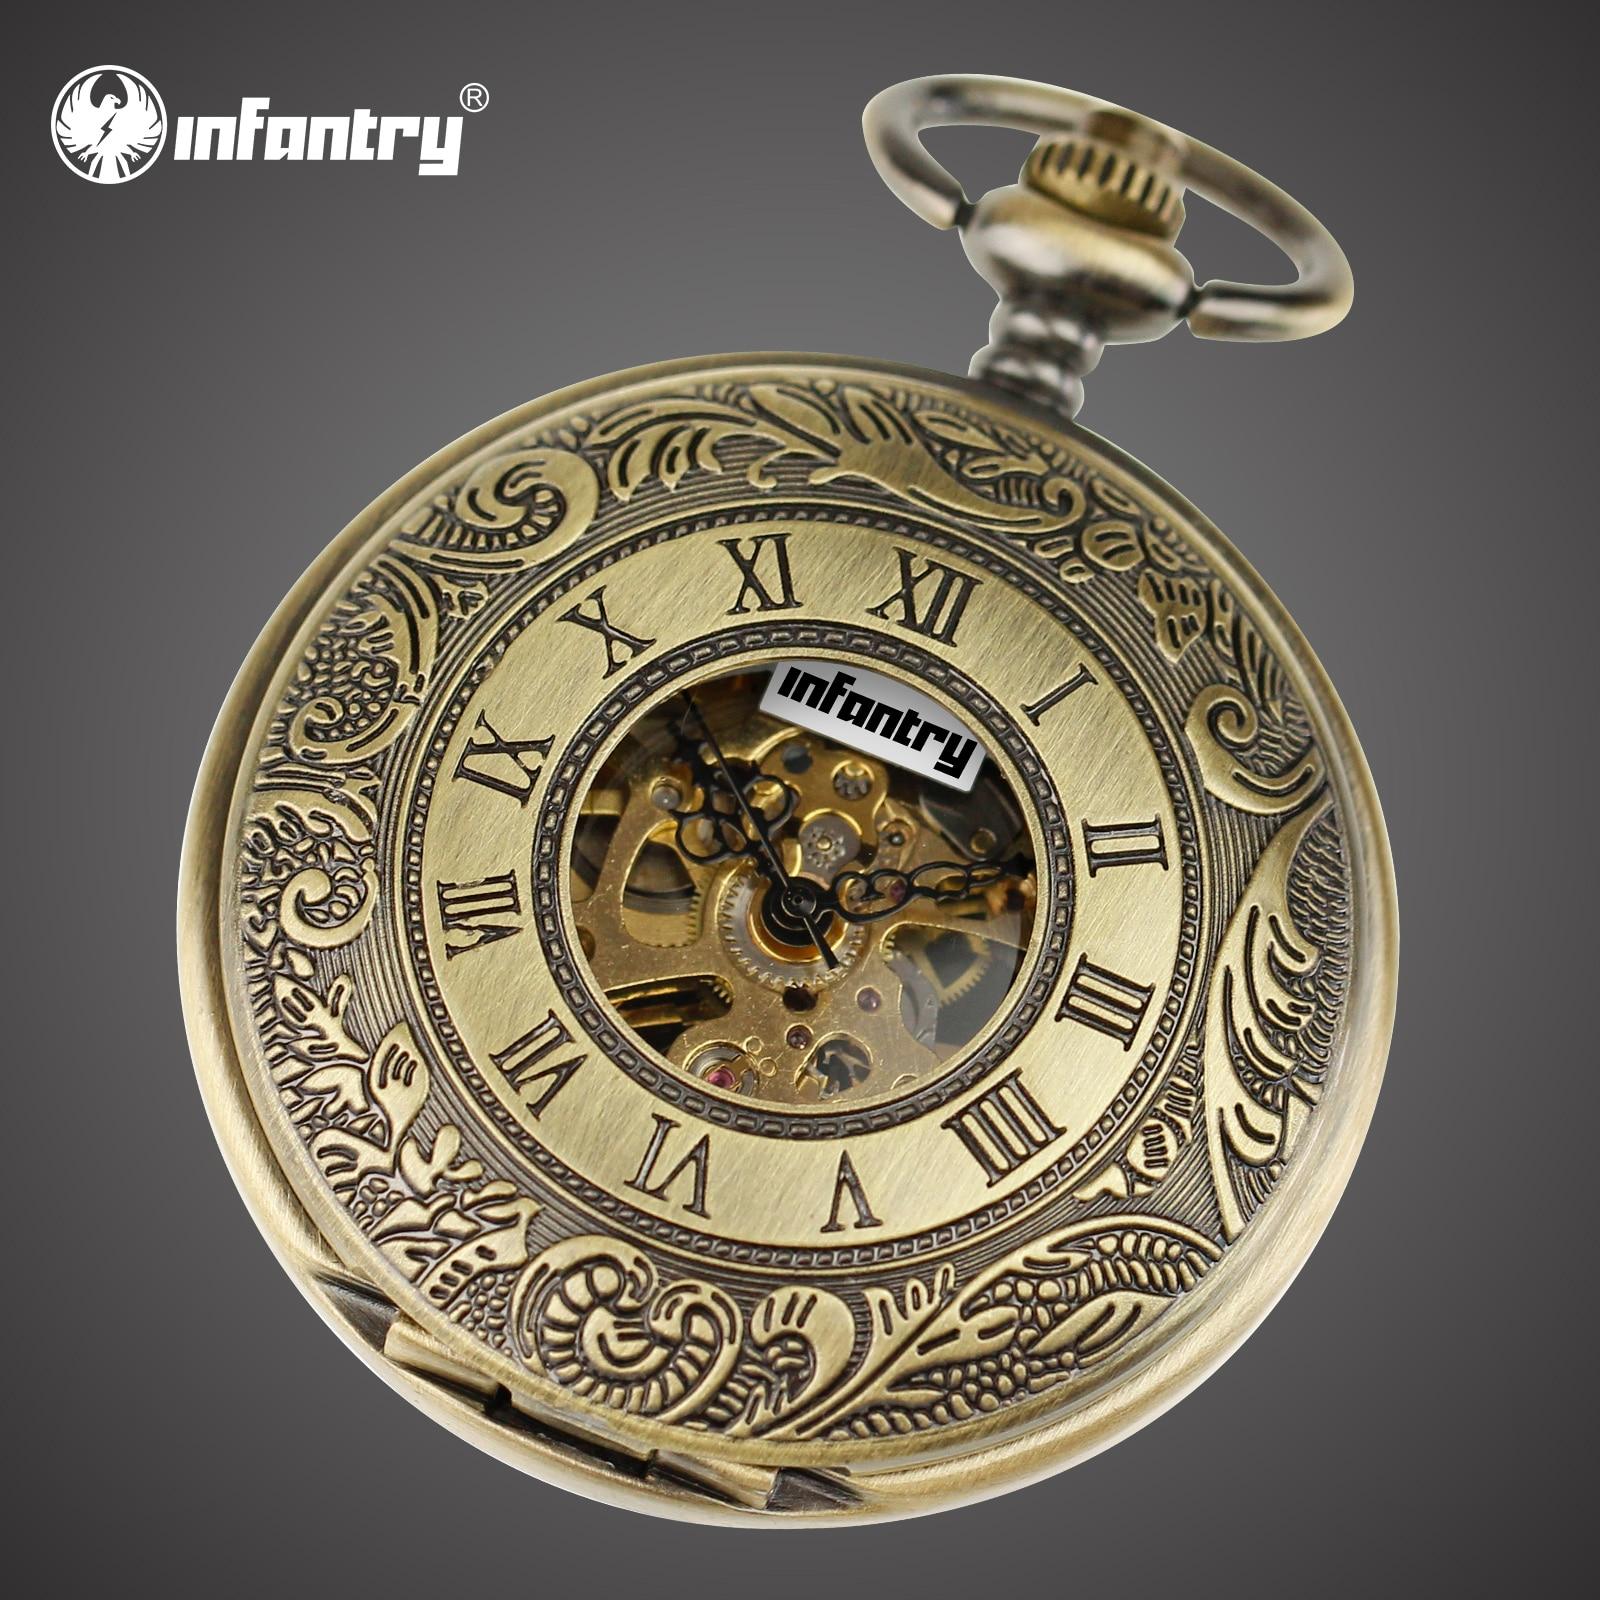 INFANTRY Pocket Watch Vintage Mechanical Skeleton Full Metal Alchemist Steampunk Keychain Fob Clock Chain Pocket Watches Men